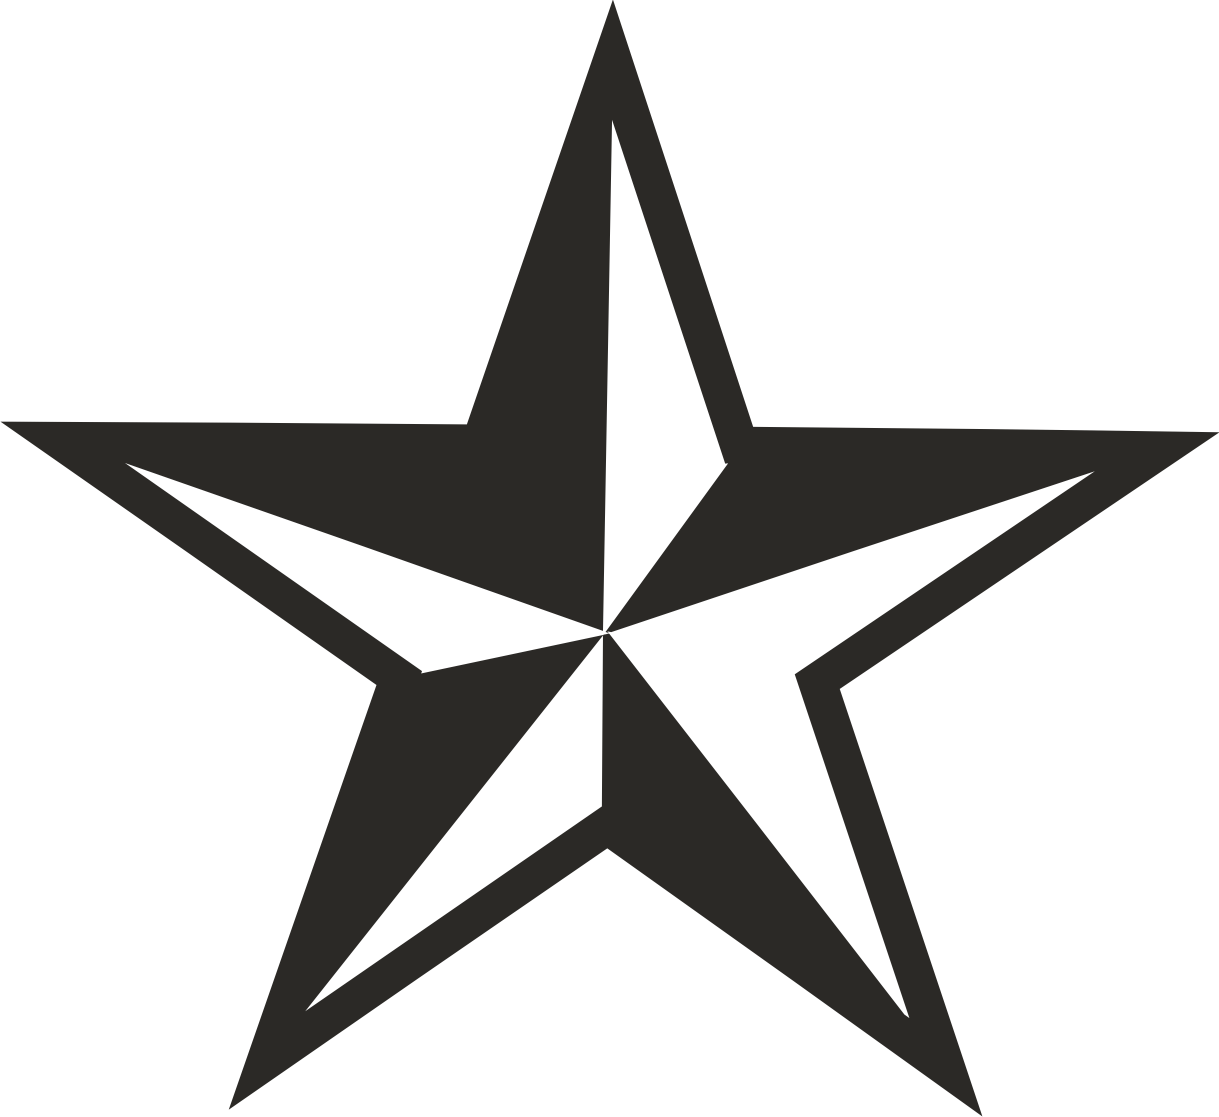 Star 3 Png 1219 1117 Vinyl Star Decals Star Decals Colour Star